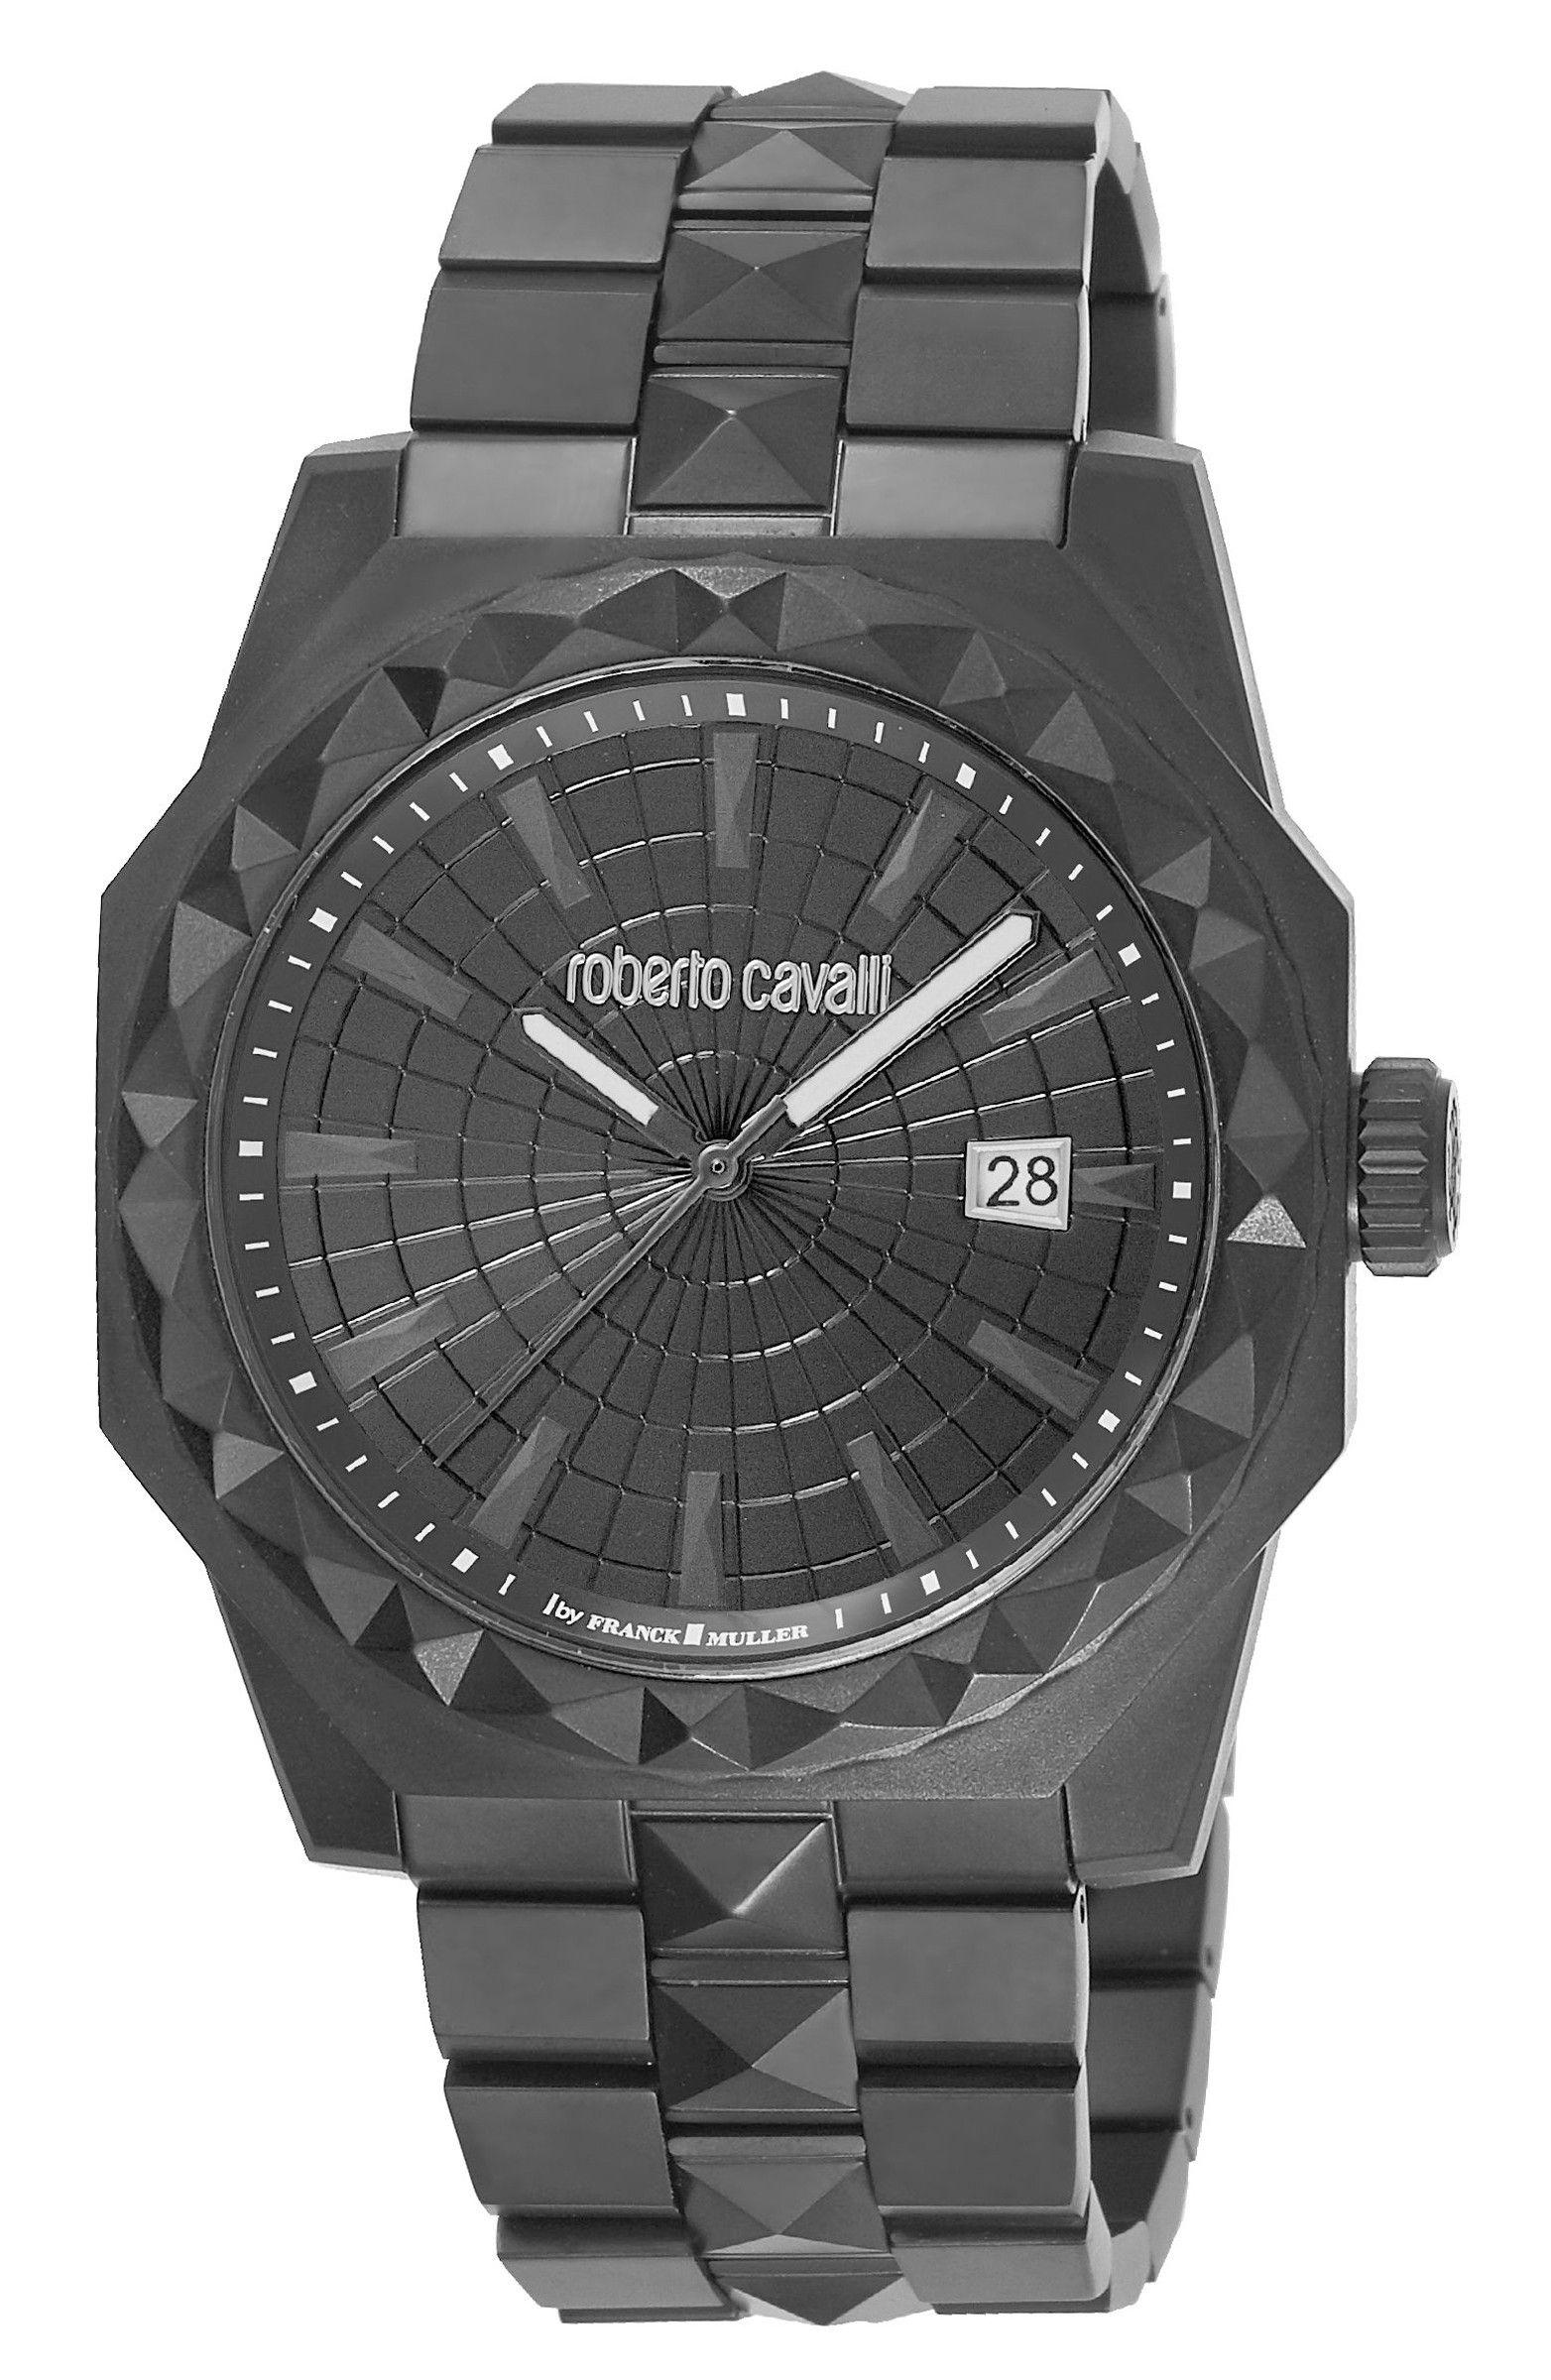 Main Image - Roberto Cavalli by Franck Muller Pyramid Bracelet Watch, 43mm